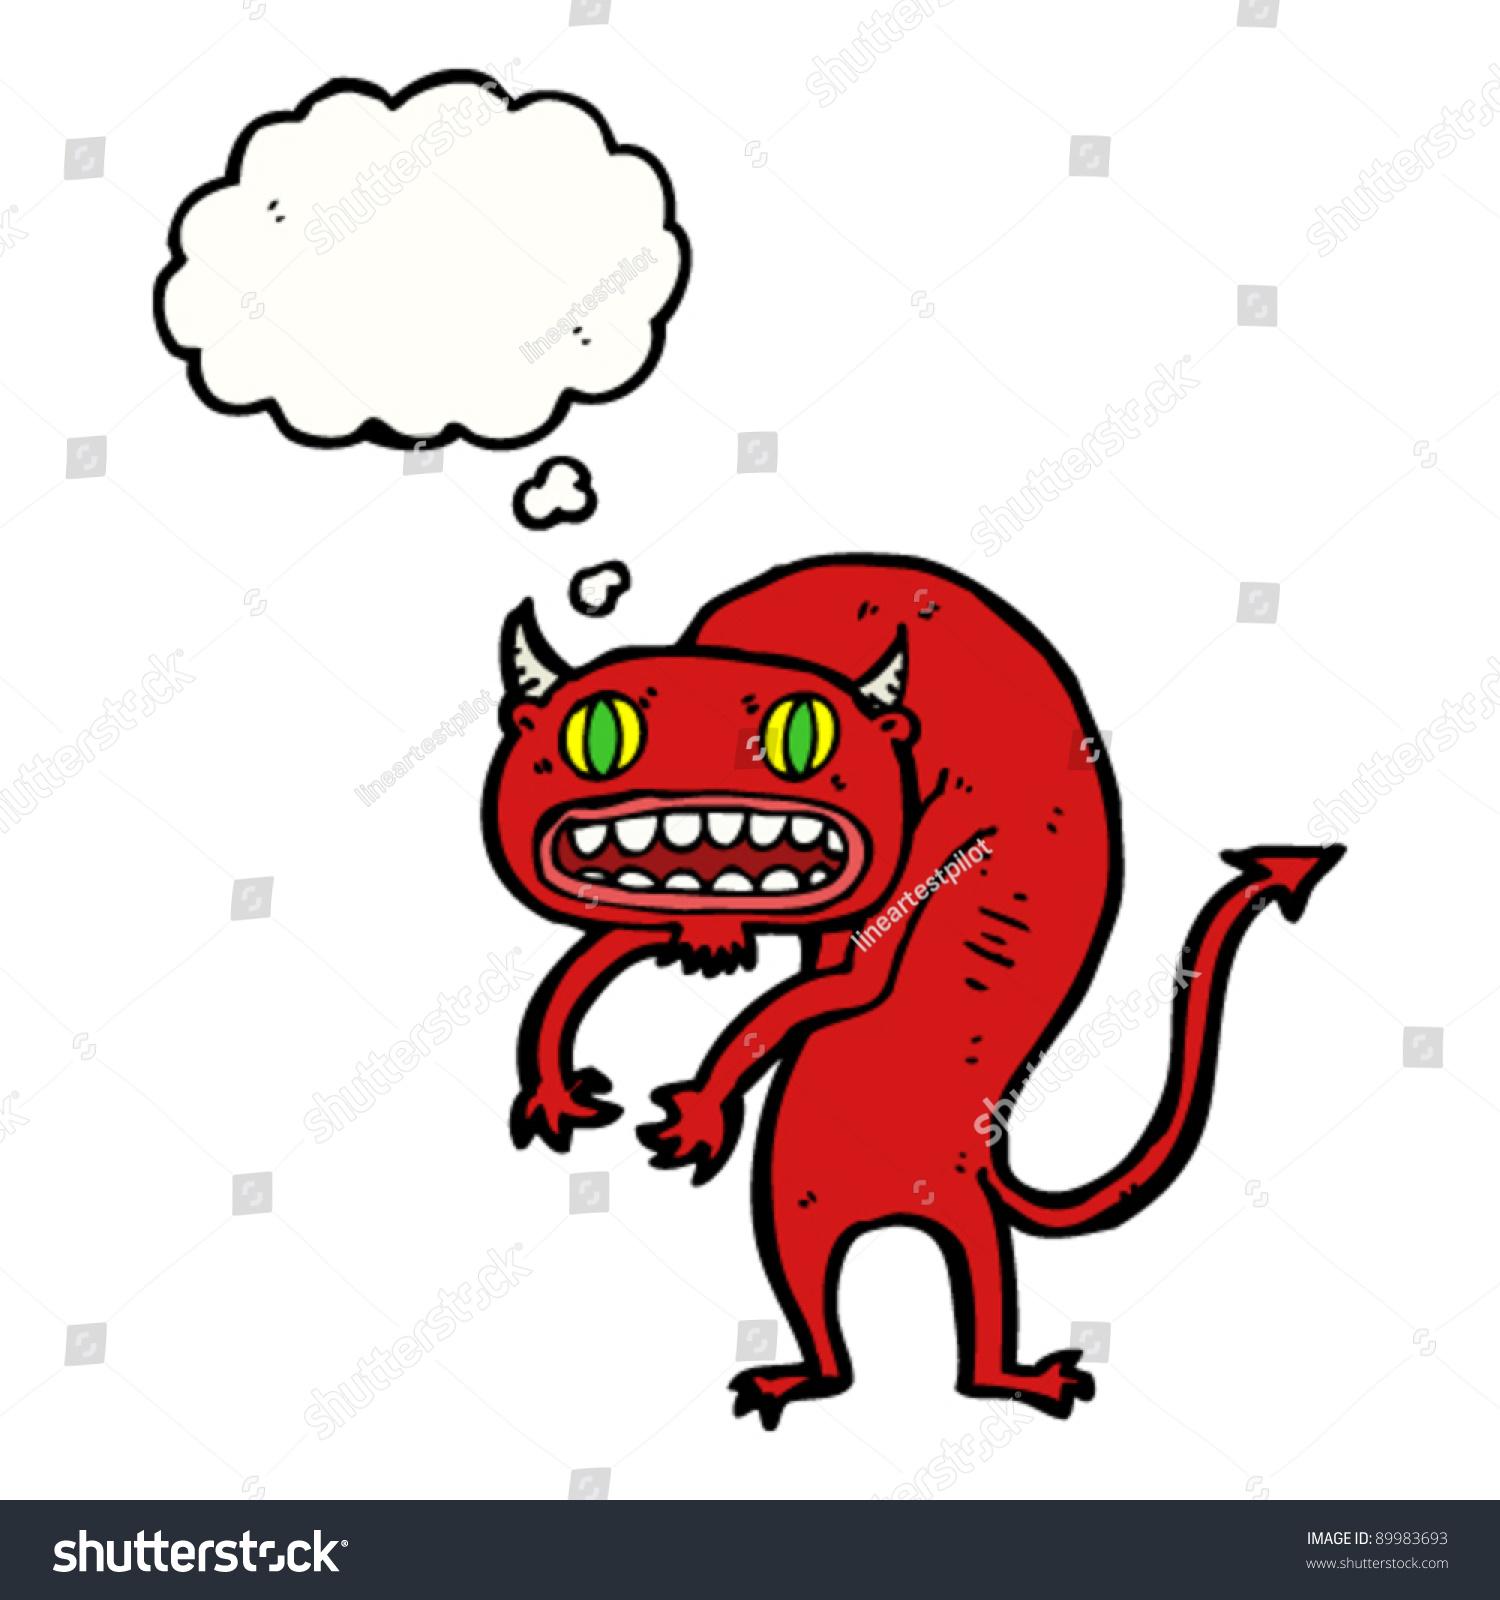 Scary Red Devil Cartoon Stock Vector Illustration 89983693 ...